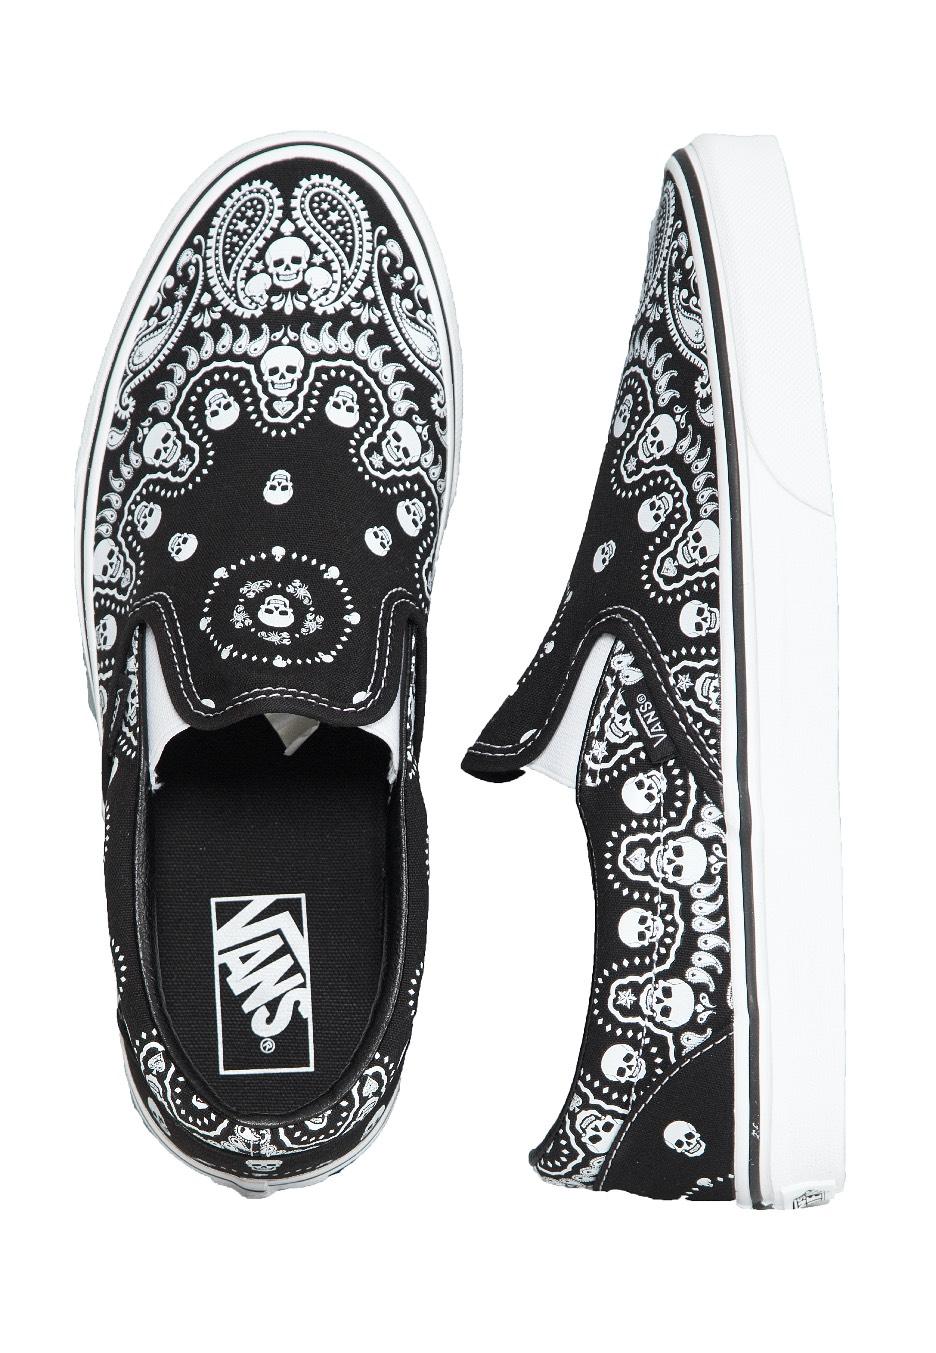 Vans - Classic Slip On (Bandana) Black/True White - Shoes ...